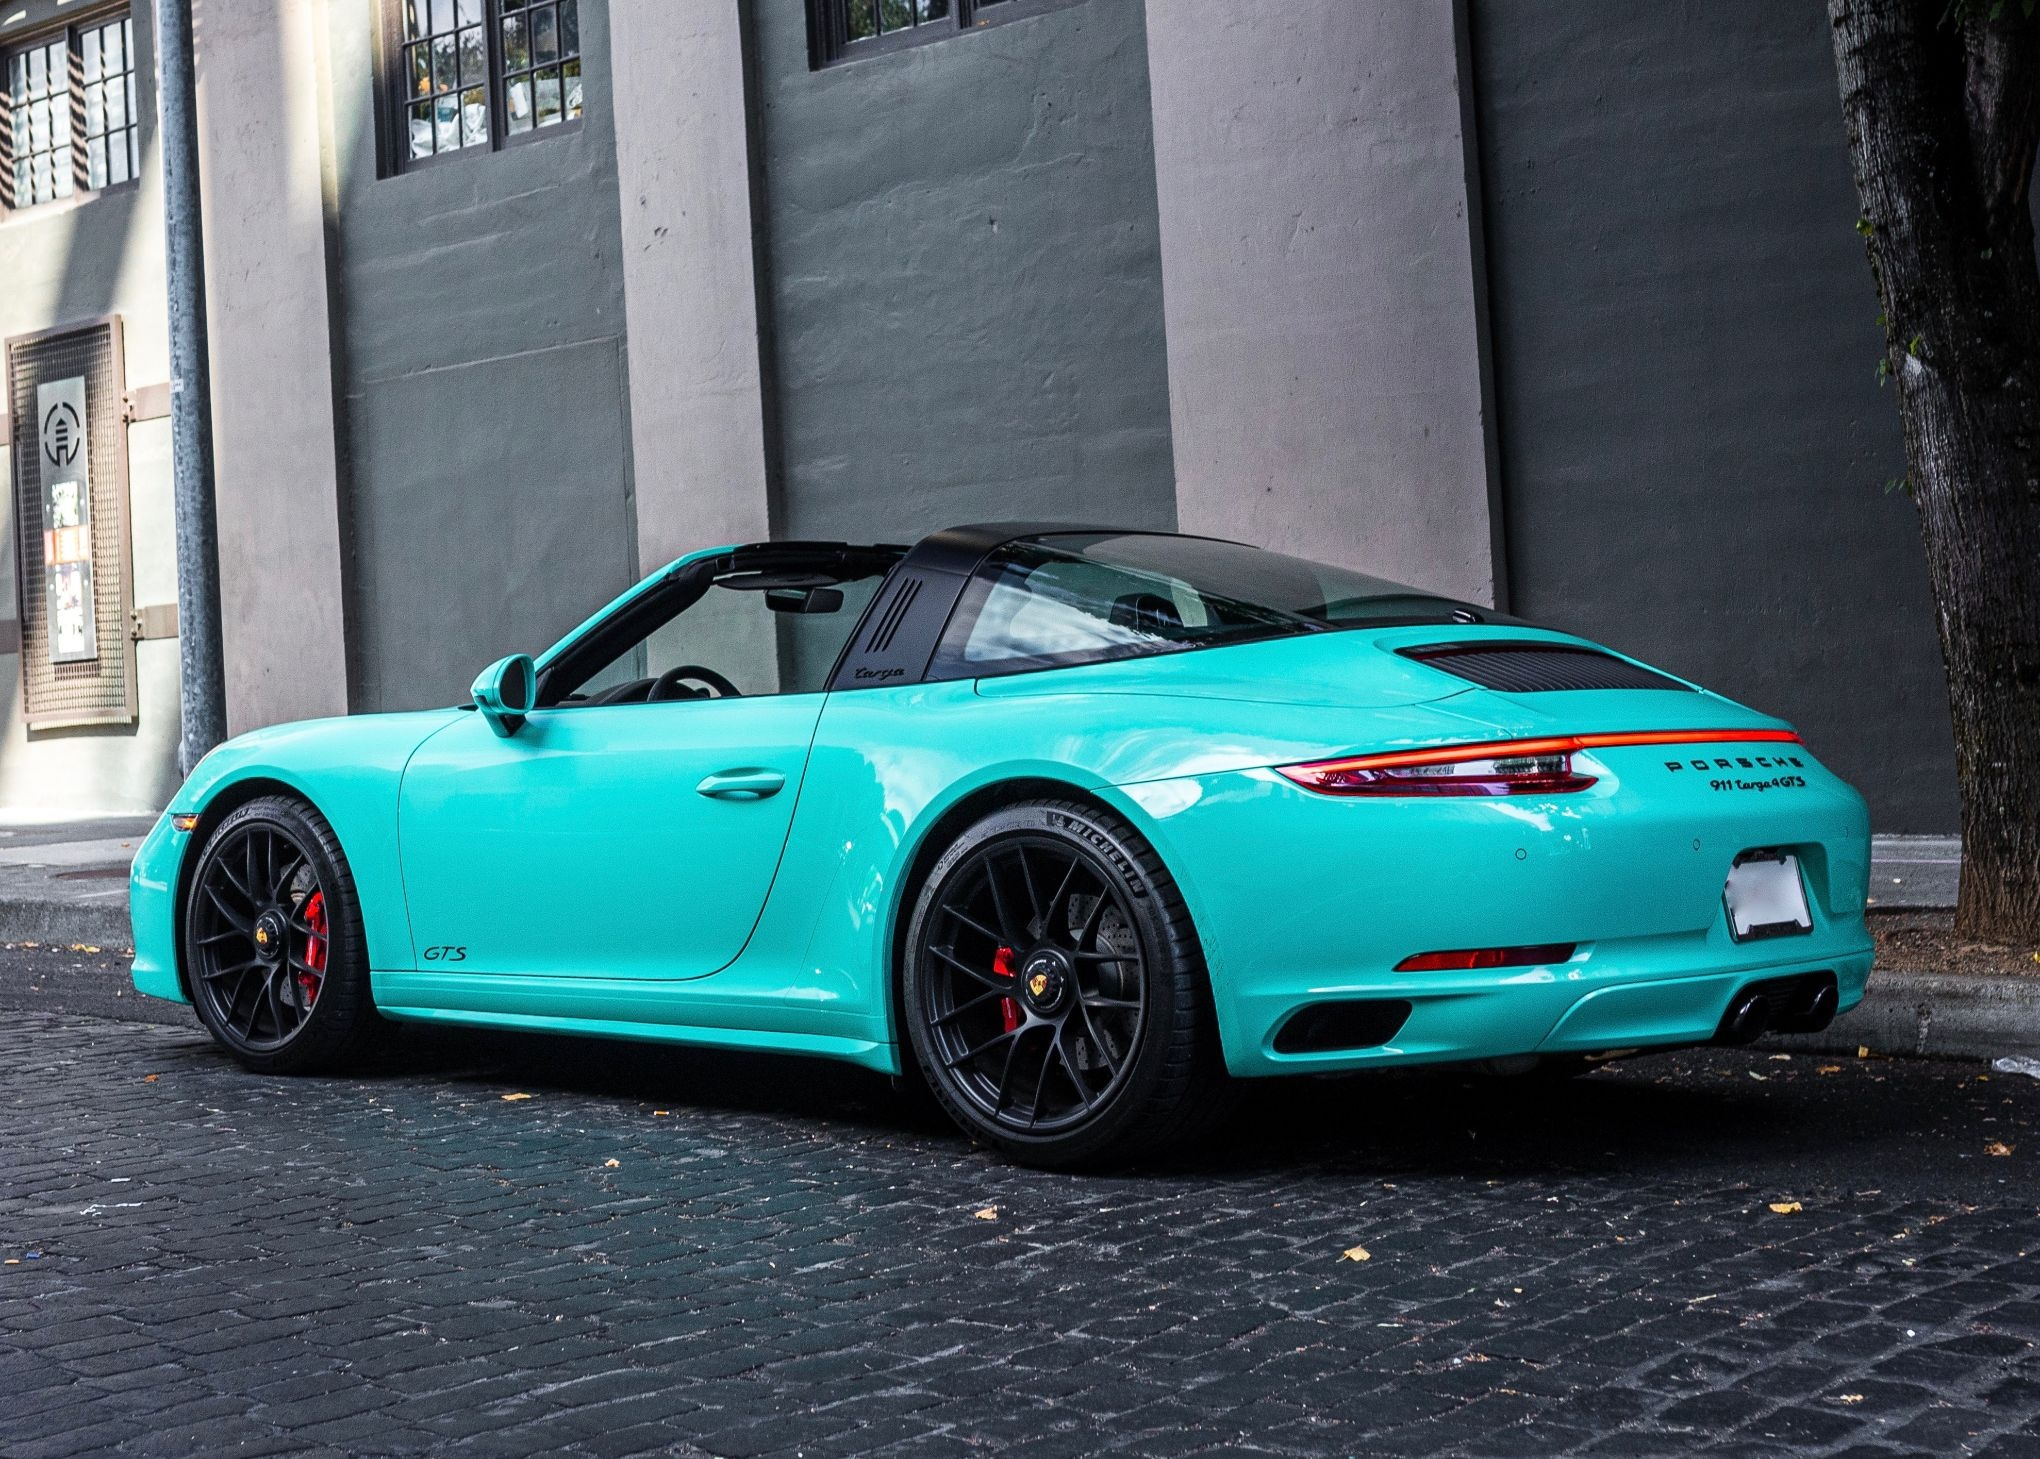 2019 Porsche 991 Targa 4 Gts Pts Mint Green Pcarmarket